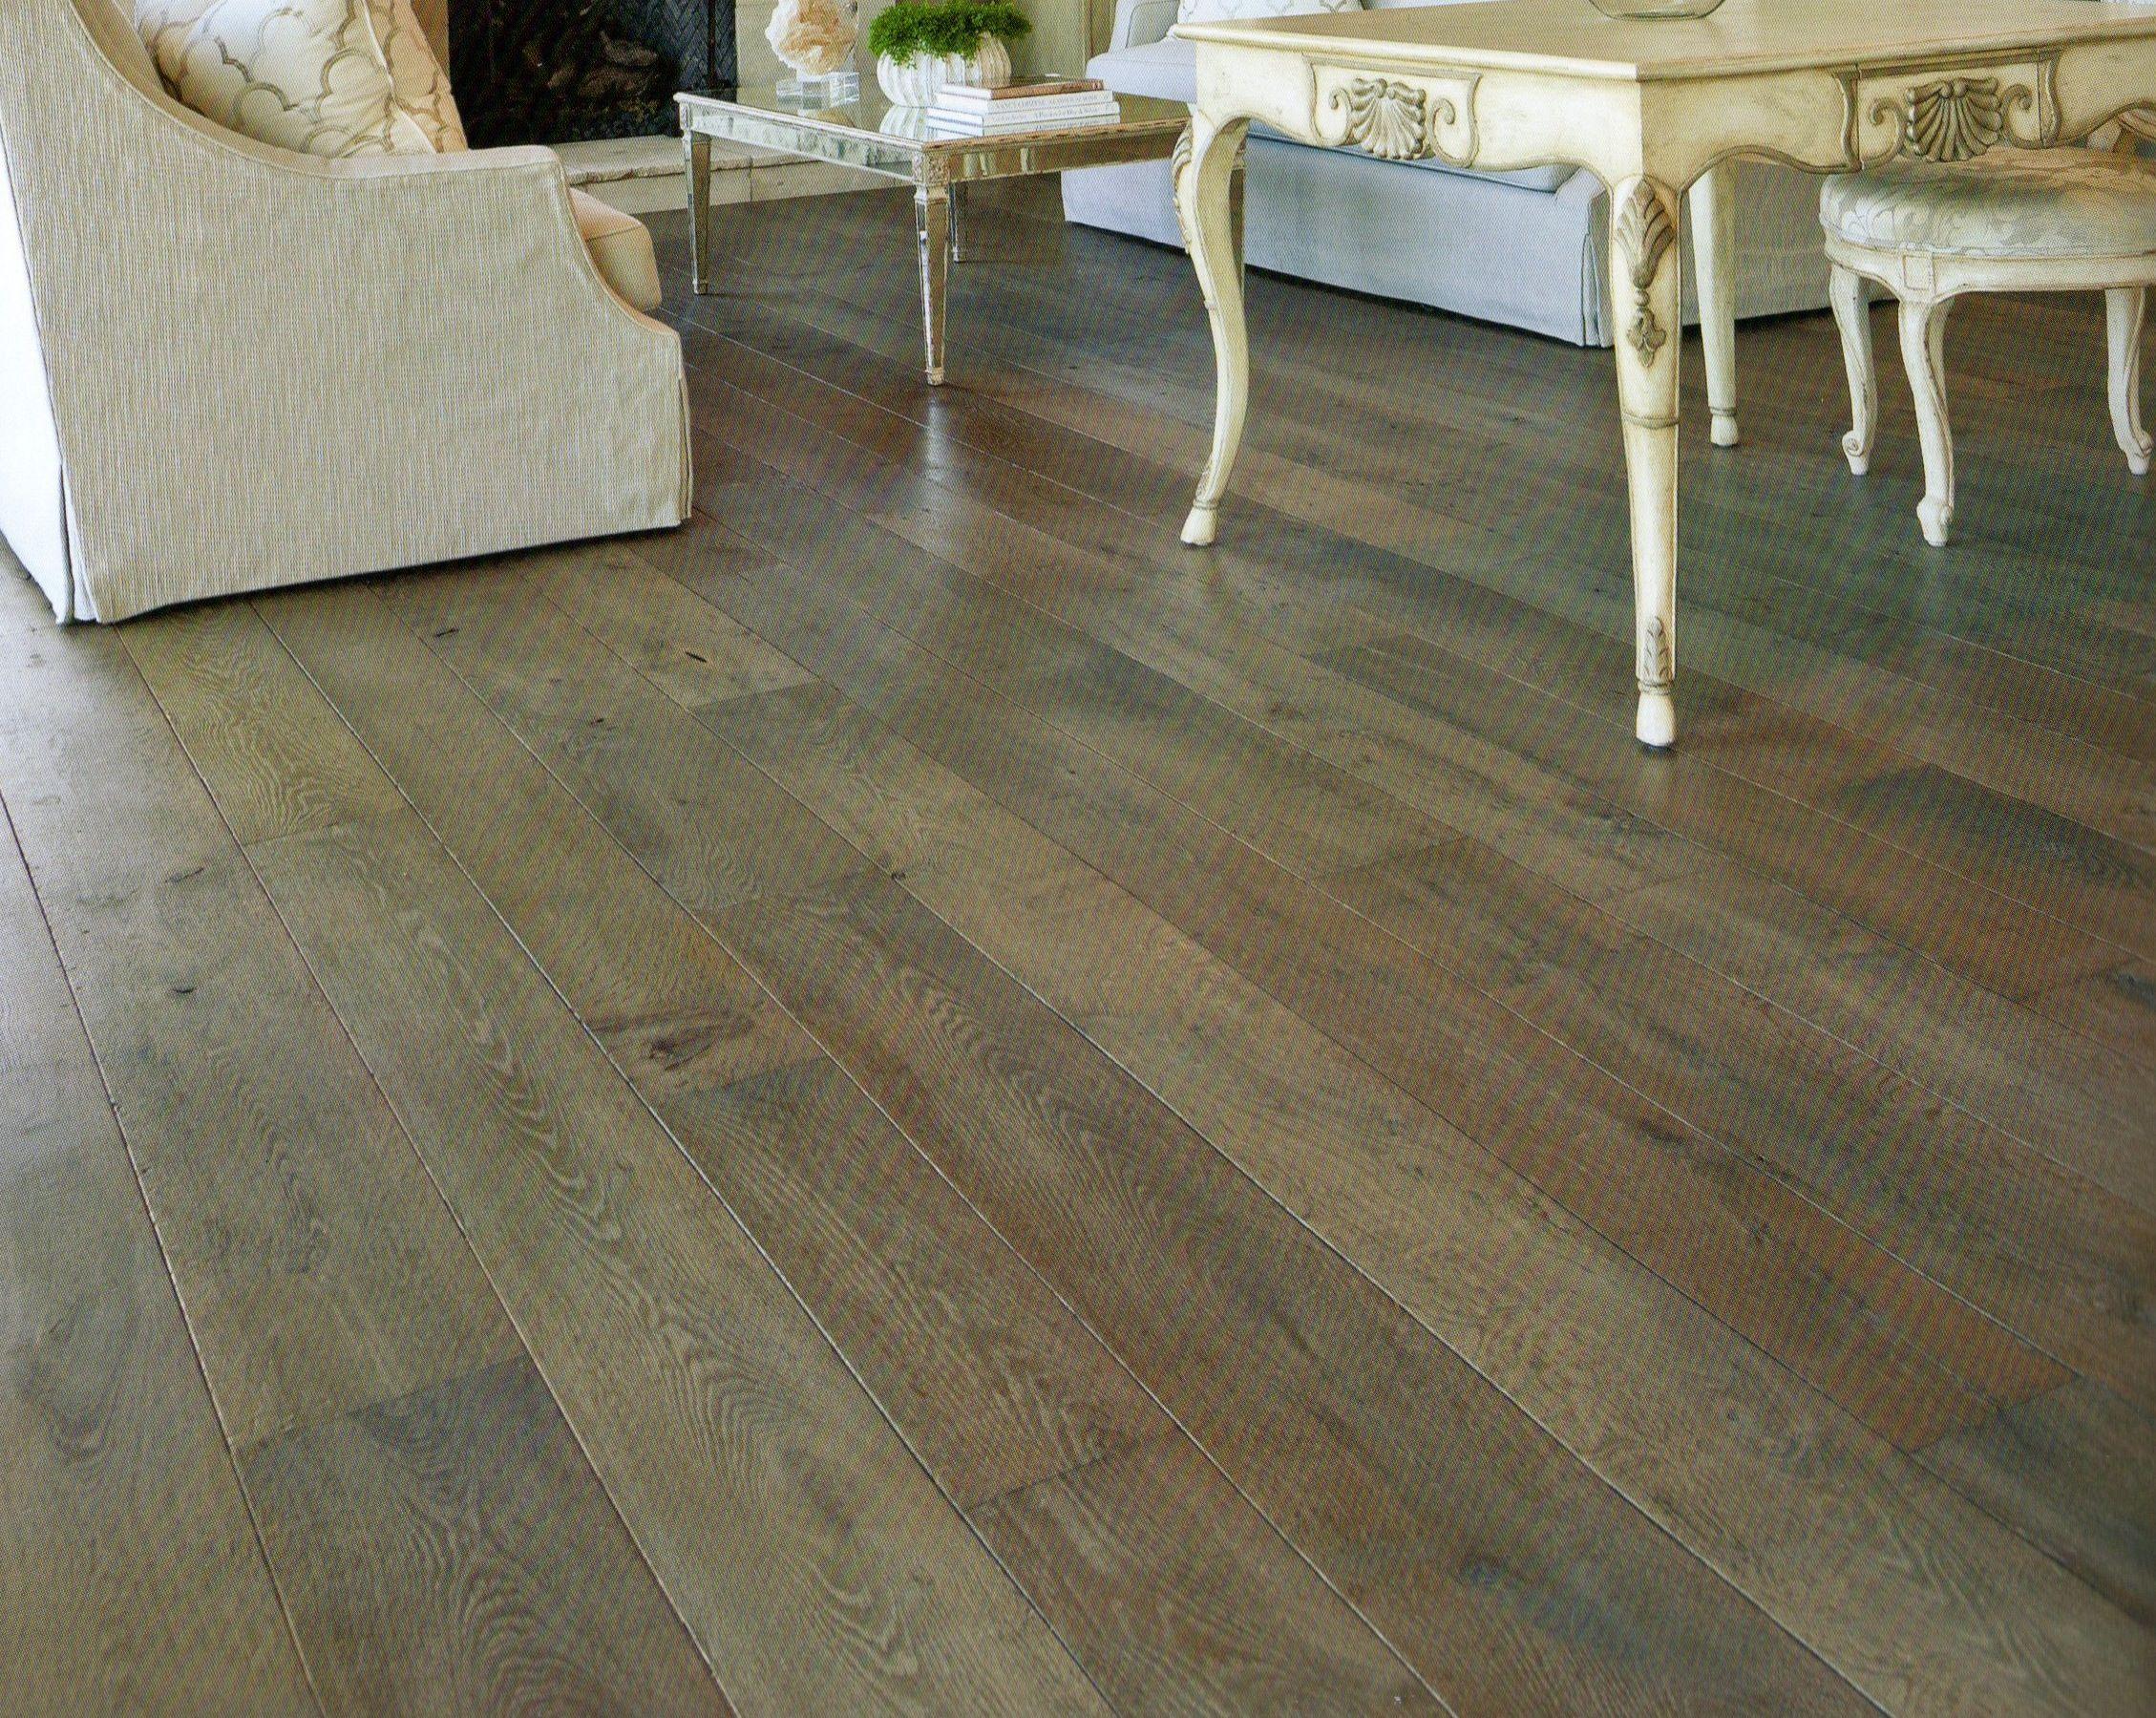 Grey Wood Floors  Project The Virginia House  Pinterest